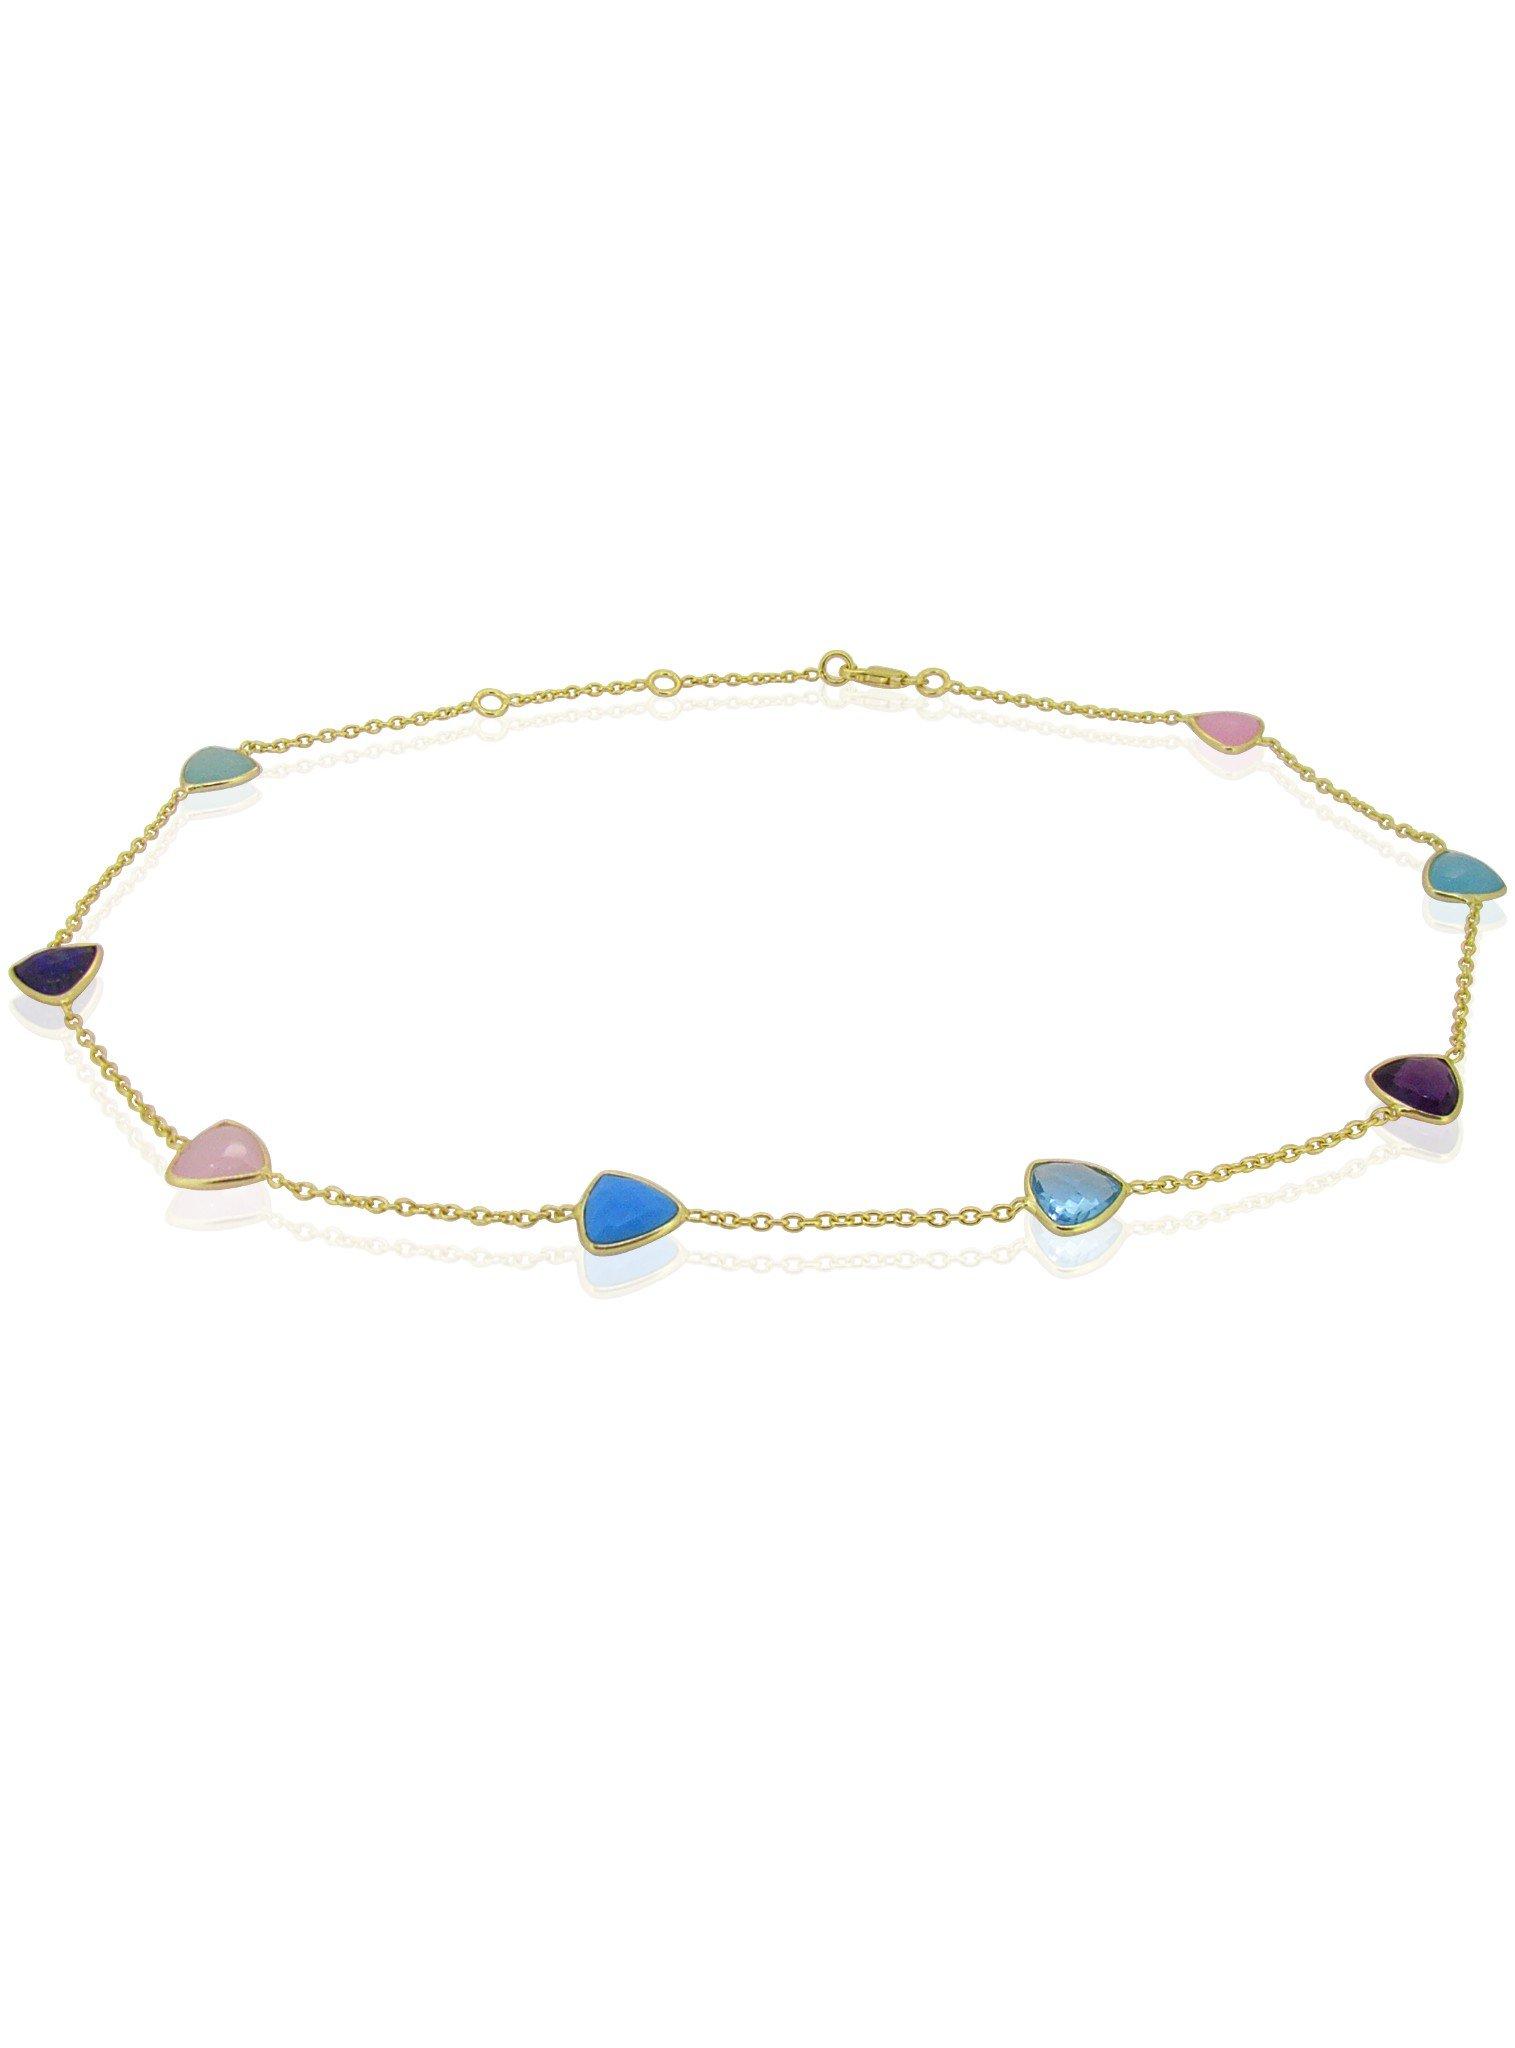 Harper Trilliant Gemstones Necklace in Gold